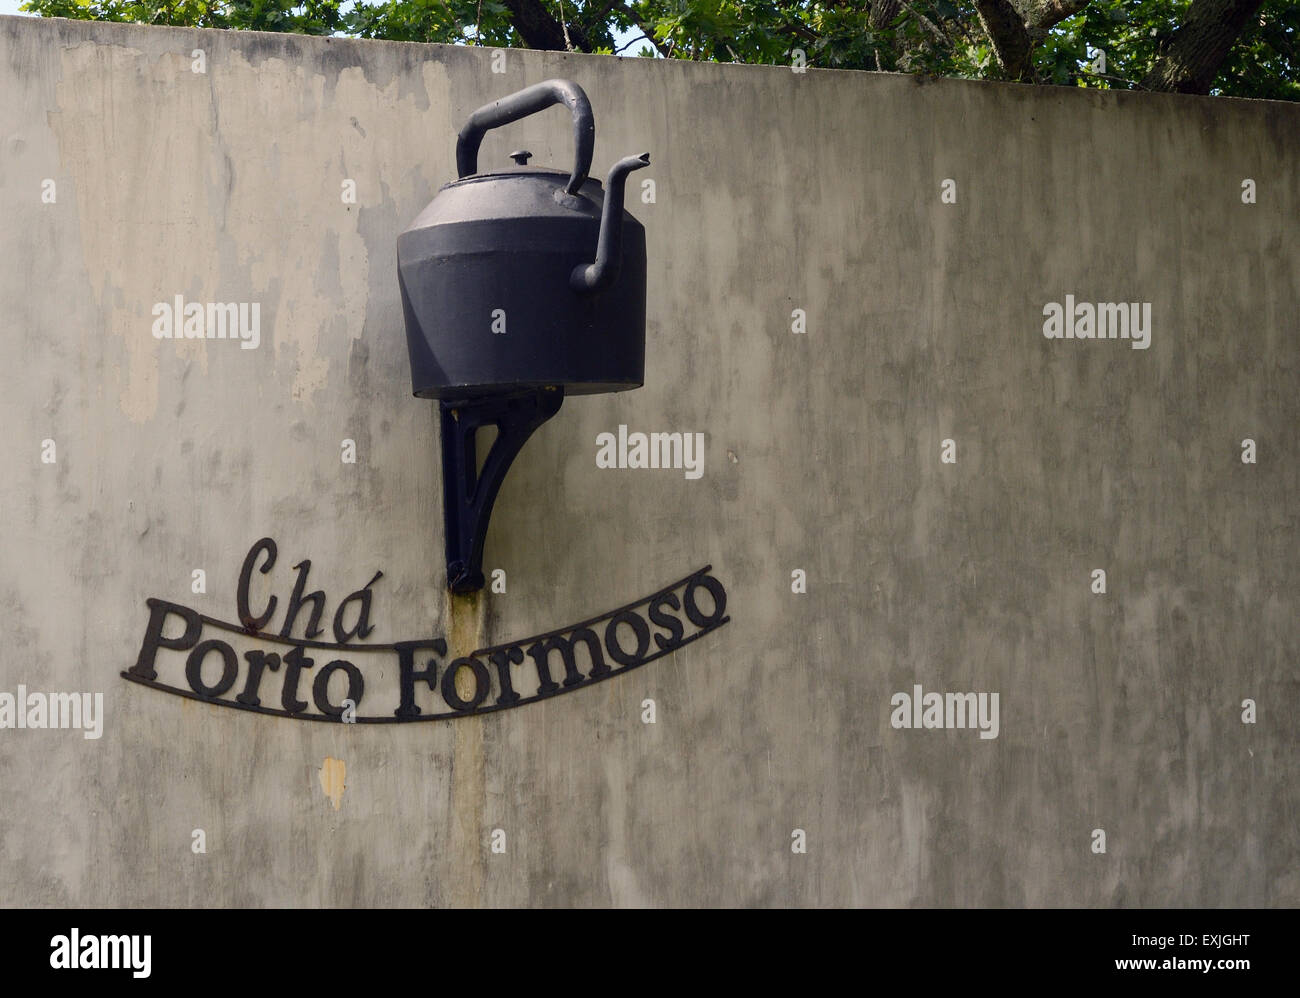 giant tea pot sign outside Europe's tea plantations - Stock Image